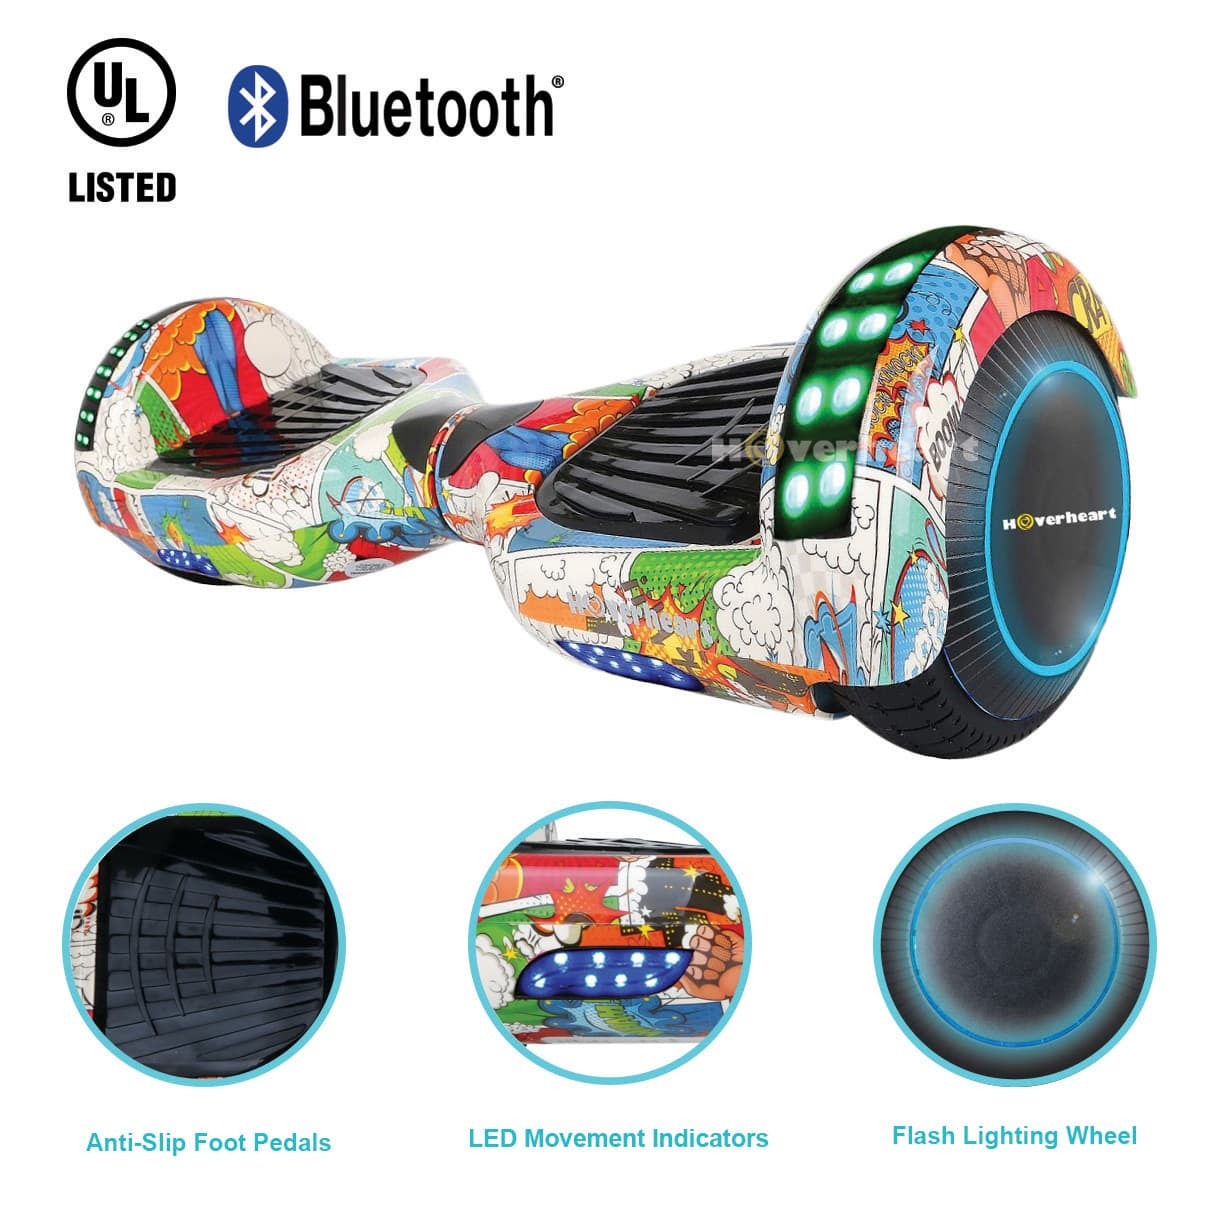 Superhero Hoverboard with Bluetooth - (originally $399)